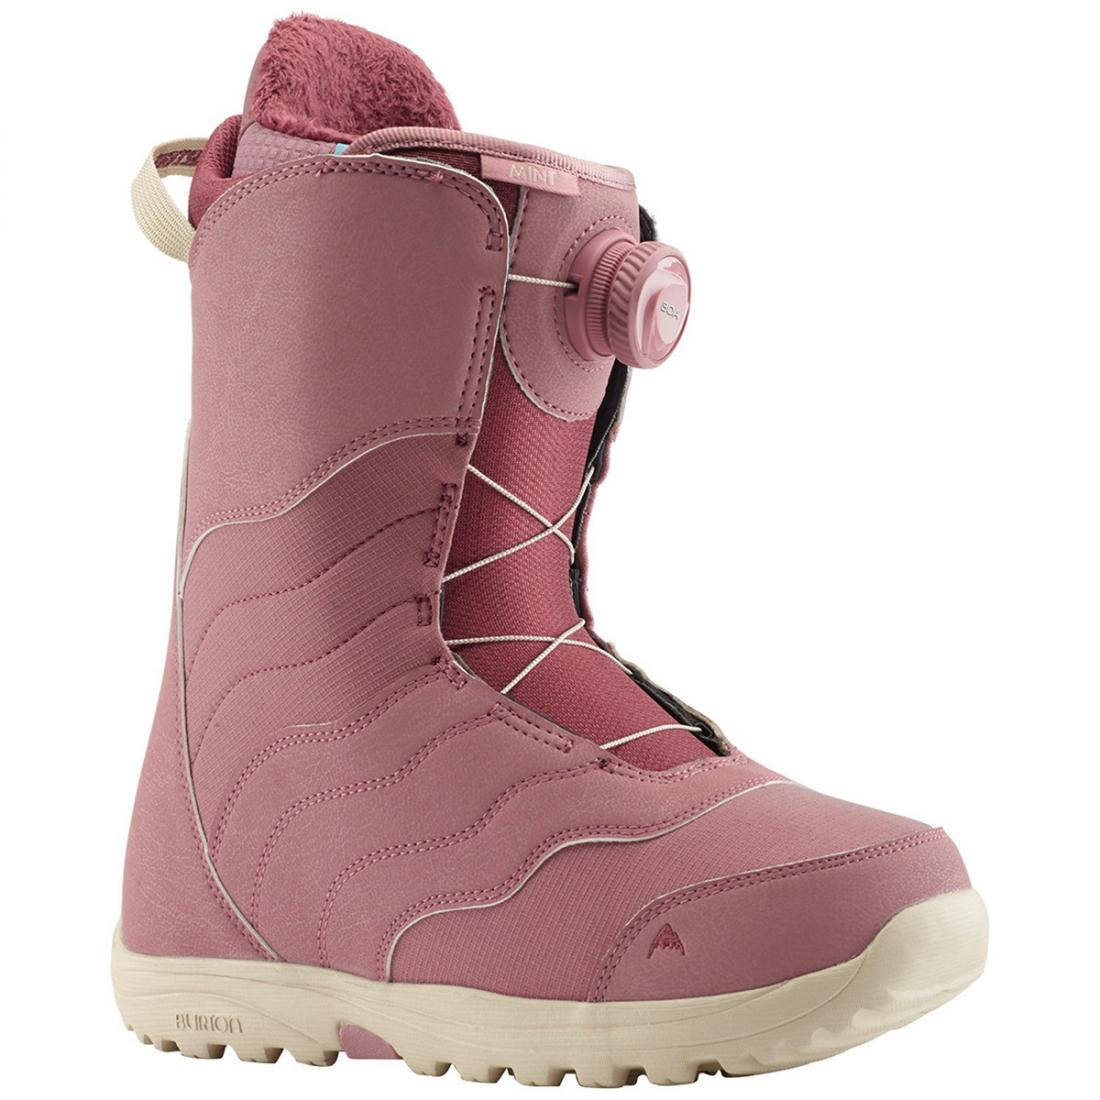 Ботинки для сноуборда Burton Mint Boa купить в Boardshop №1